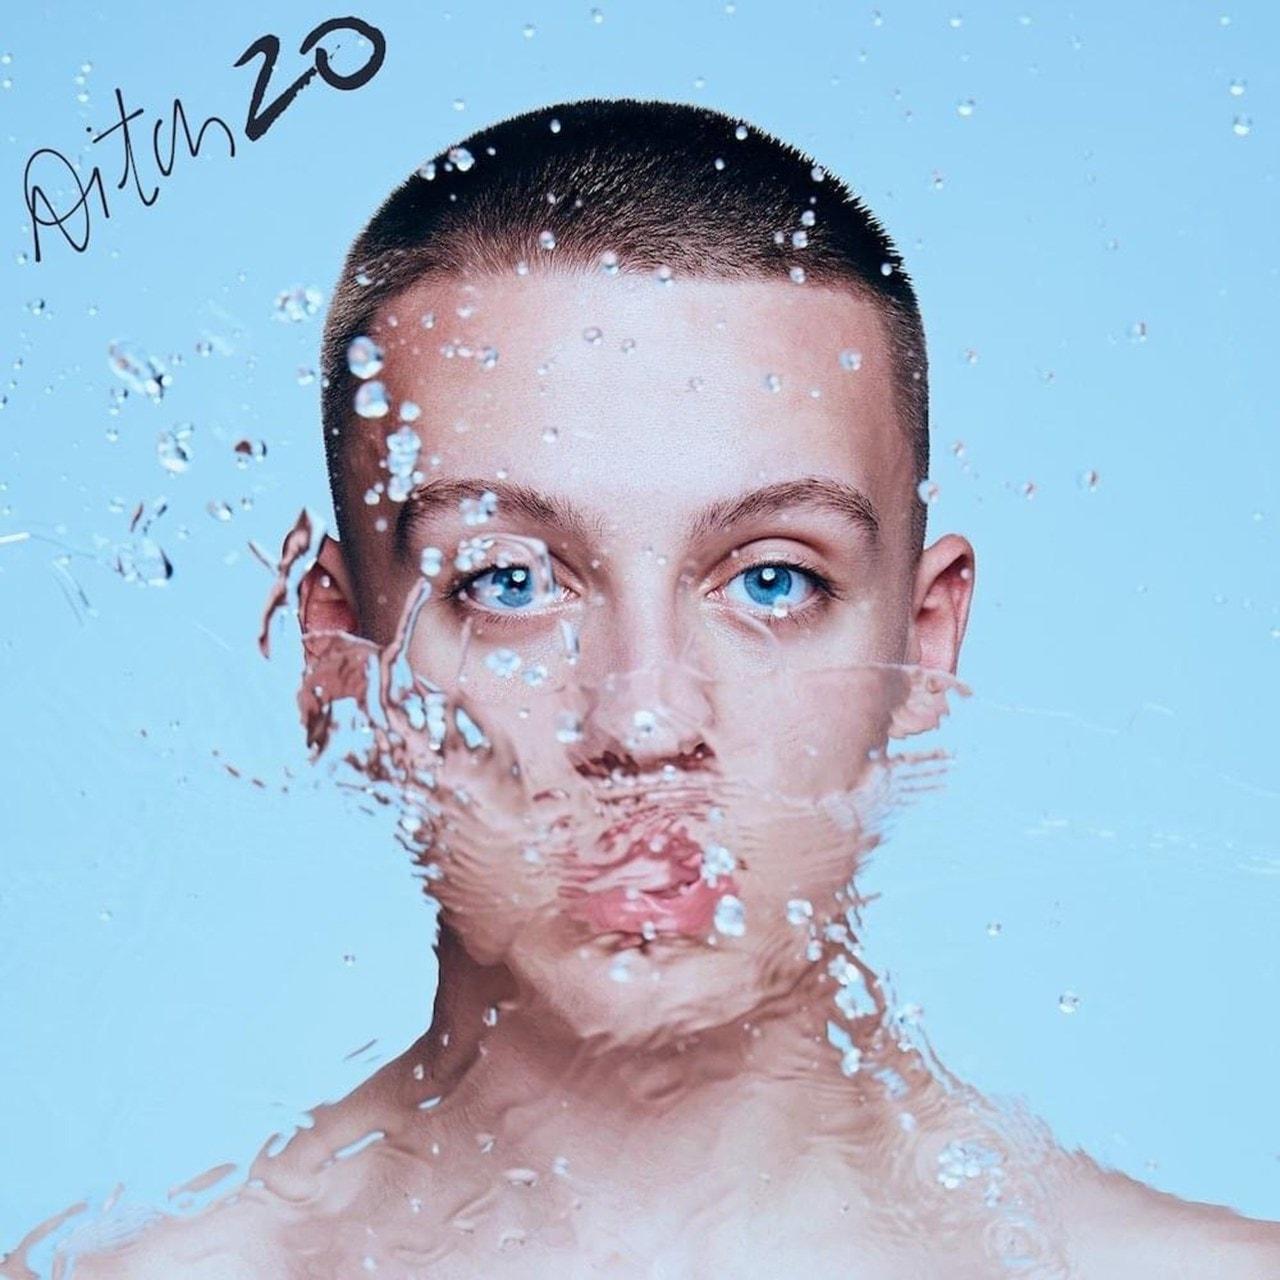 AitcH2O - 1